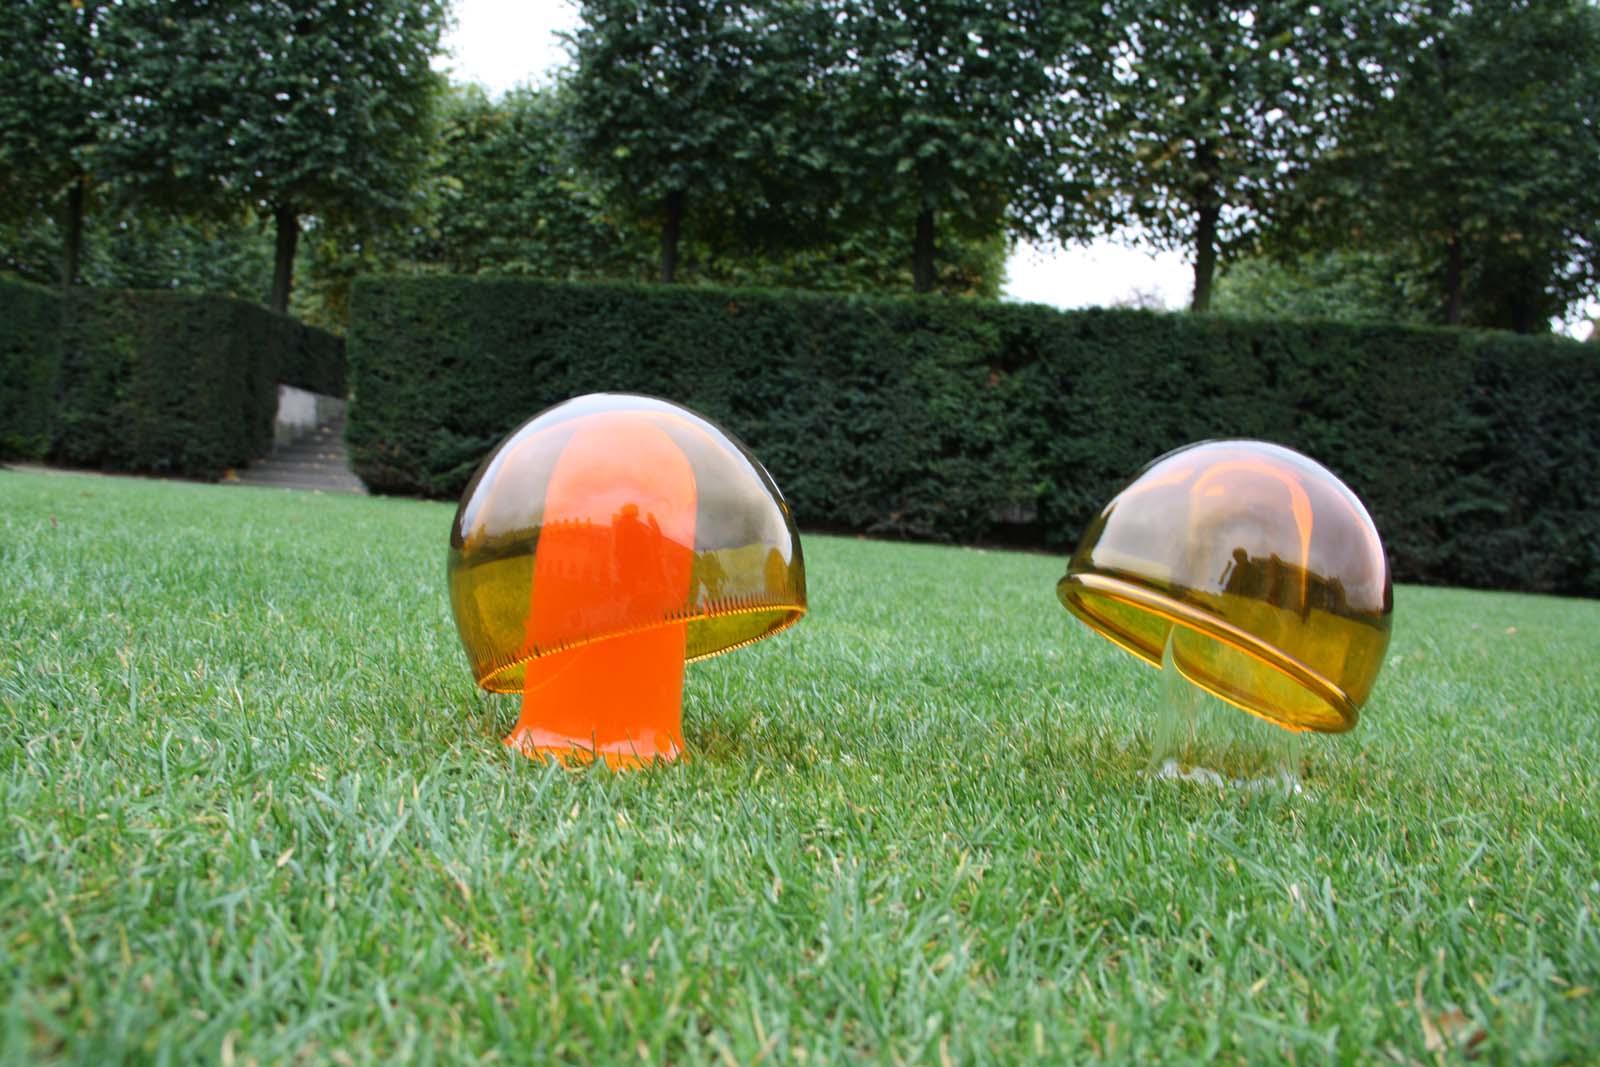 Design Protoype by Matali Crasset for GlassLab Paris, 2013.